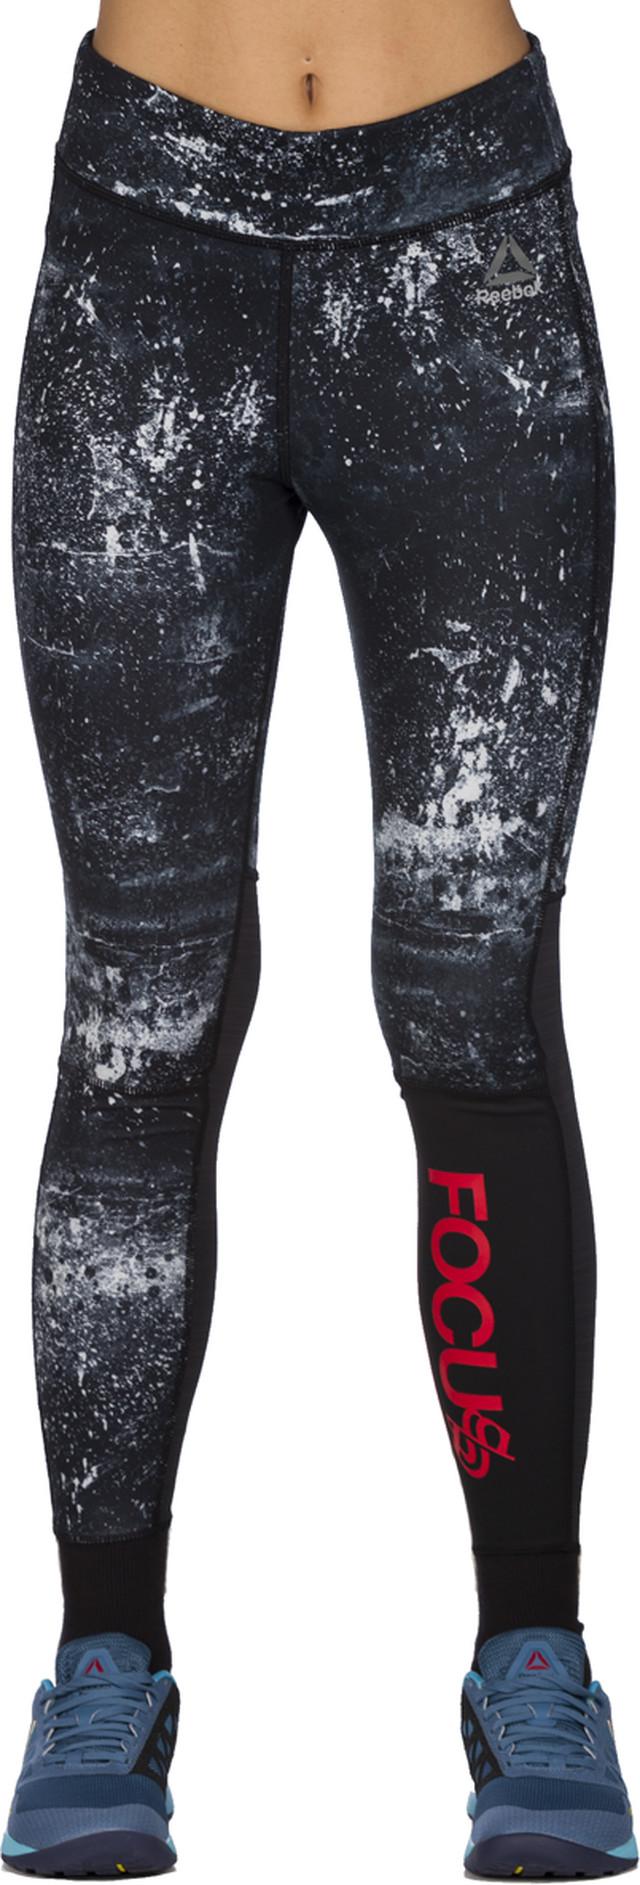 Reebok RNF Ankle Lock Tigh Black 838 AX9838